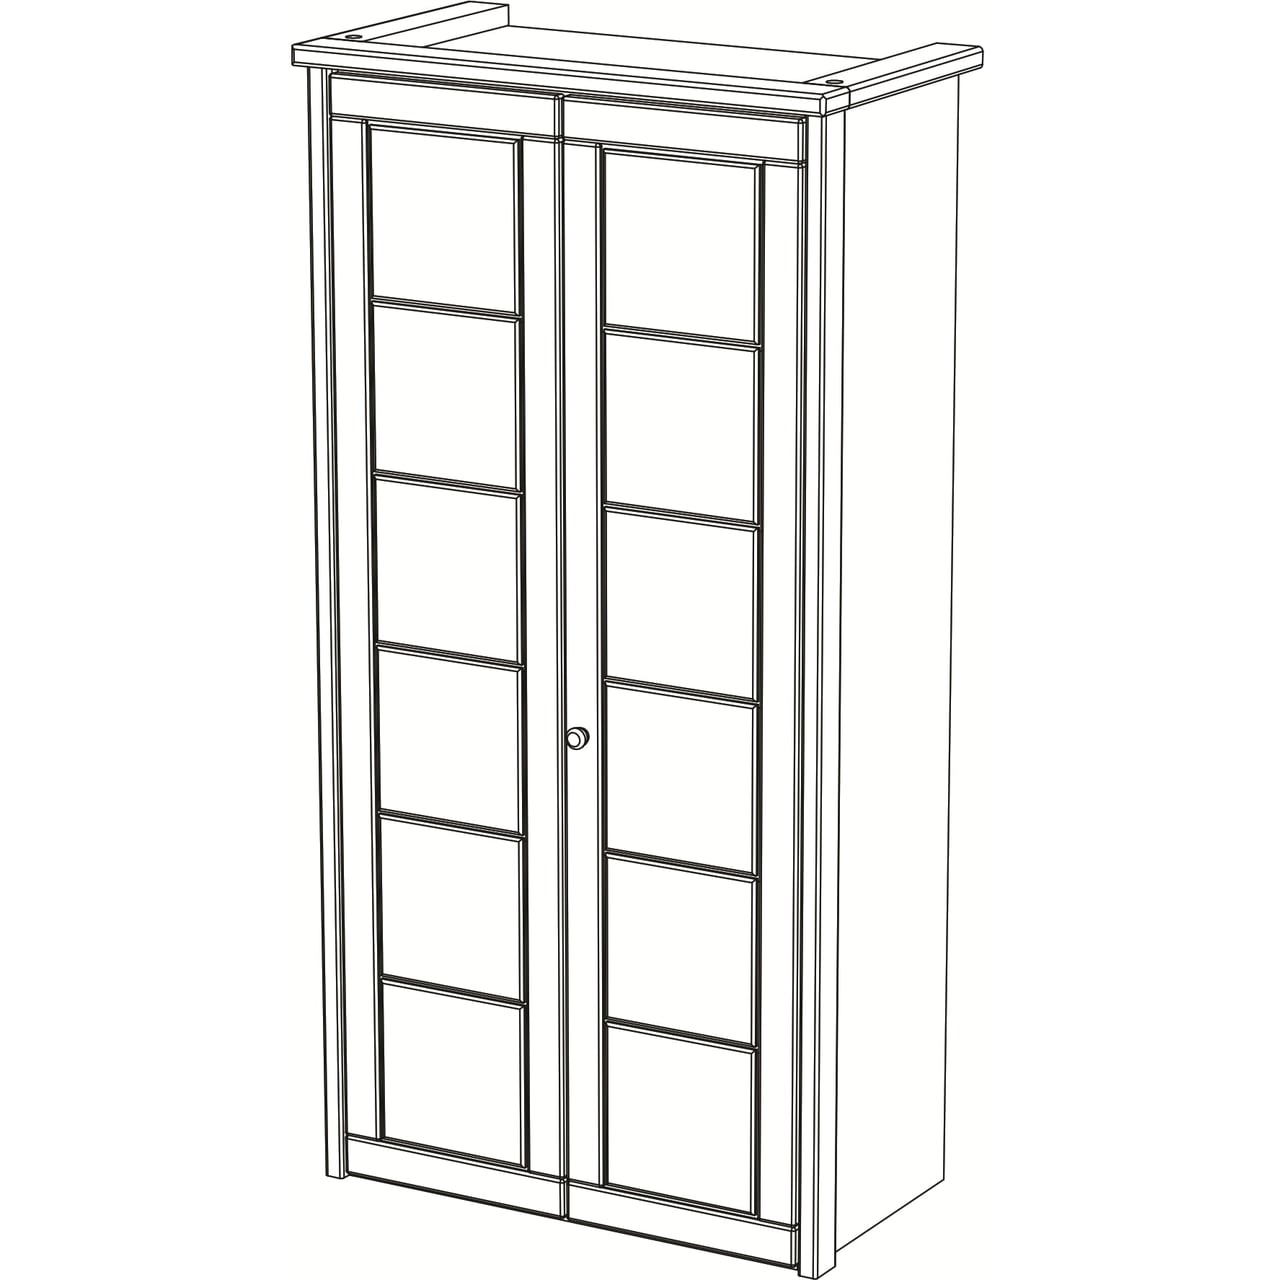 Vita Kleiderschrank, 2-türig